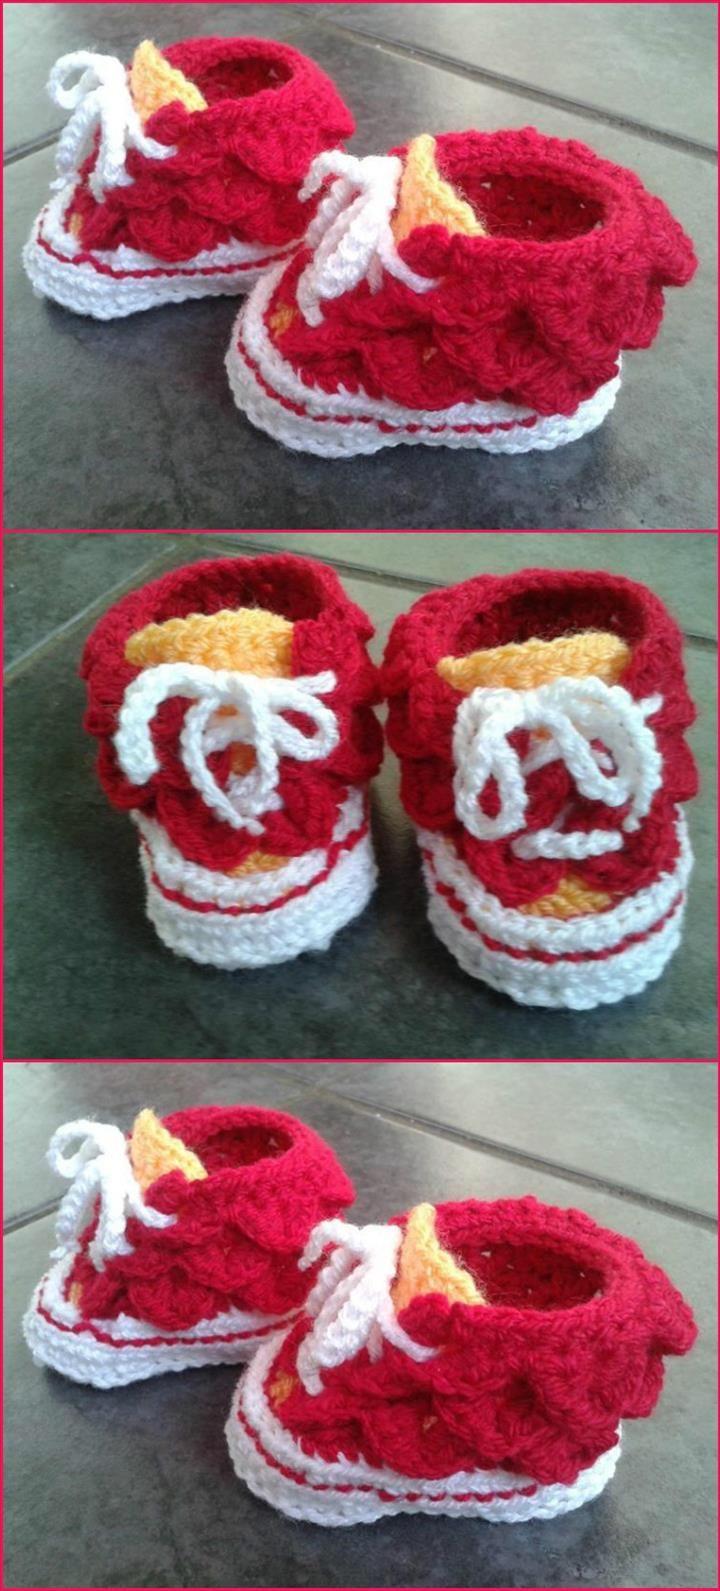 Crochet Baby Booties - Top 40 Free Crochet Patterns | Zapatos niño y ...